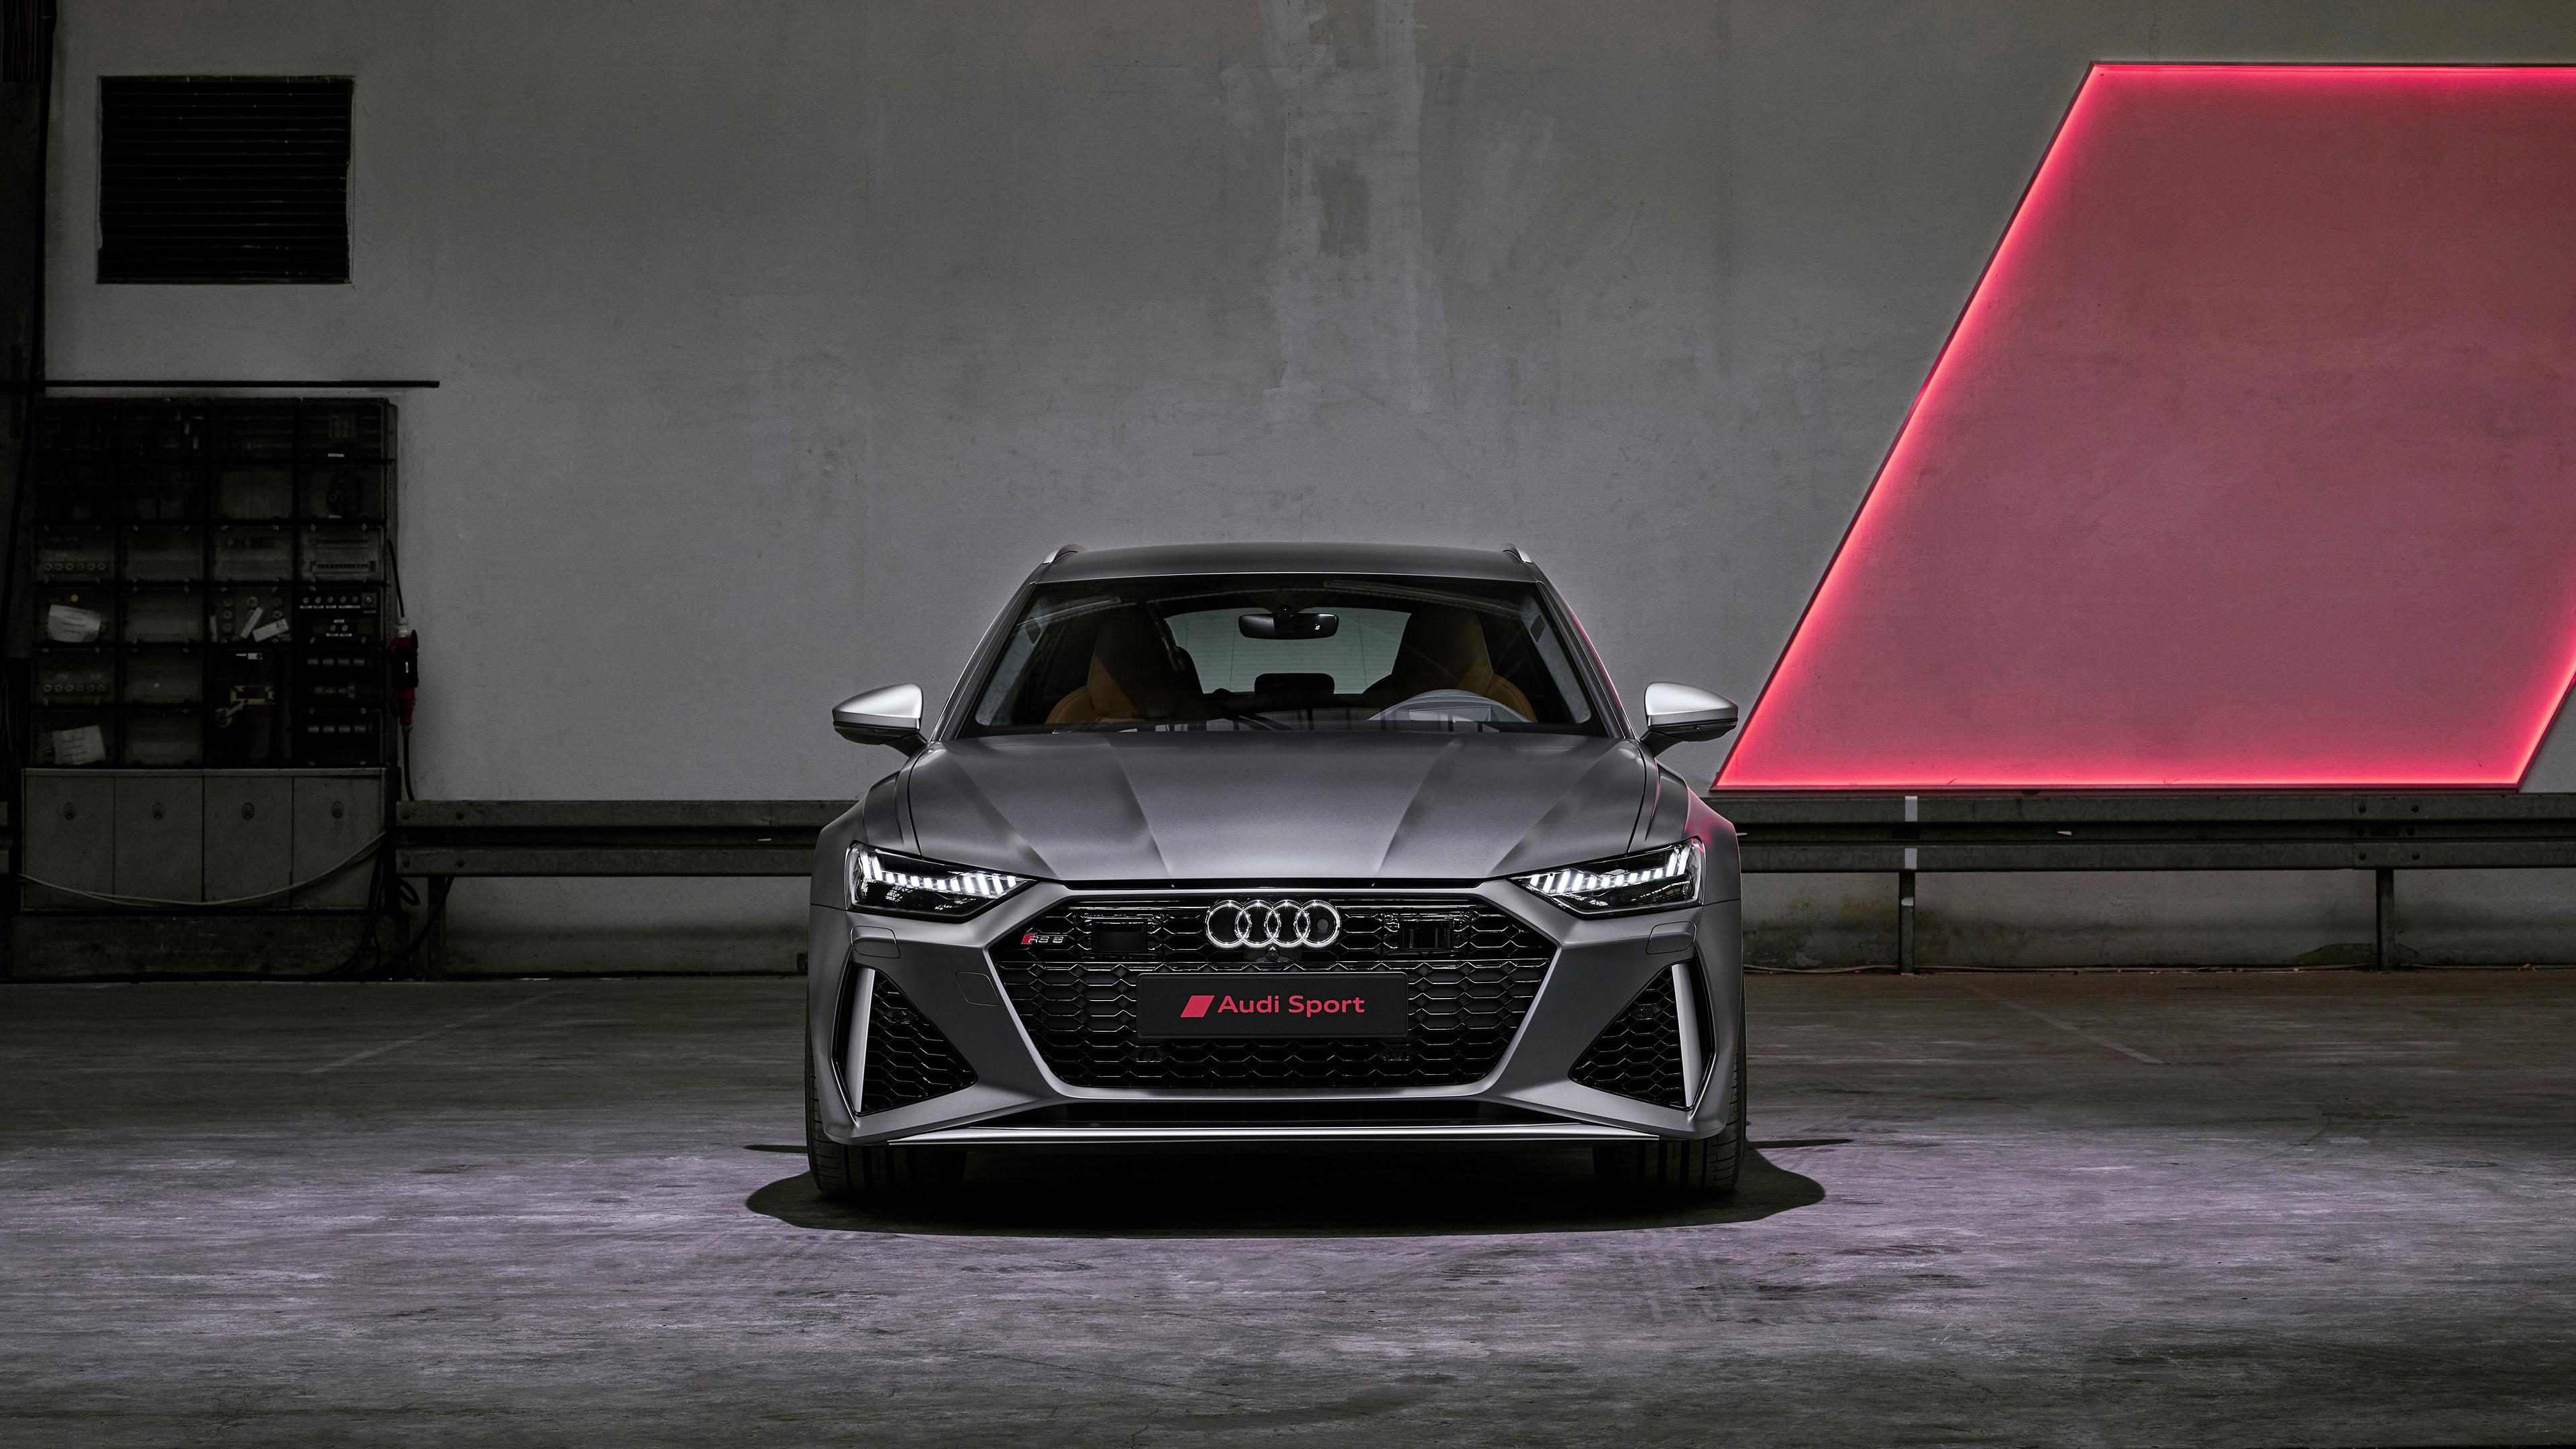 2020 Audi RS6 Avant 4K 2 Wallpaper HD Car Wallpapers ID 13060 3840x2160